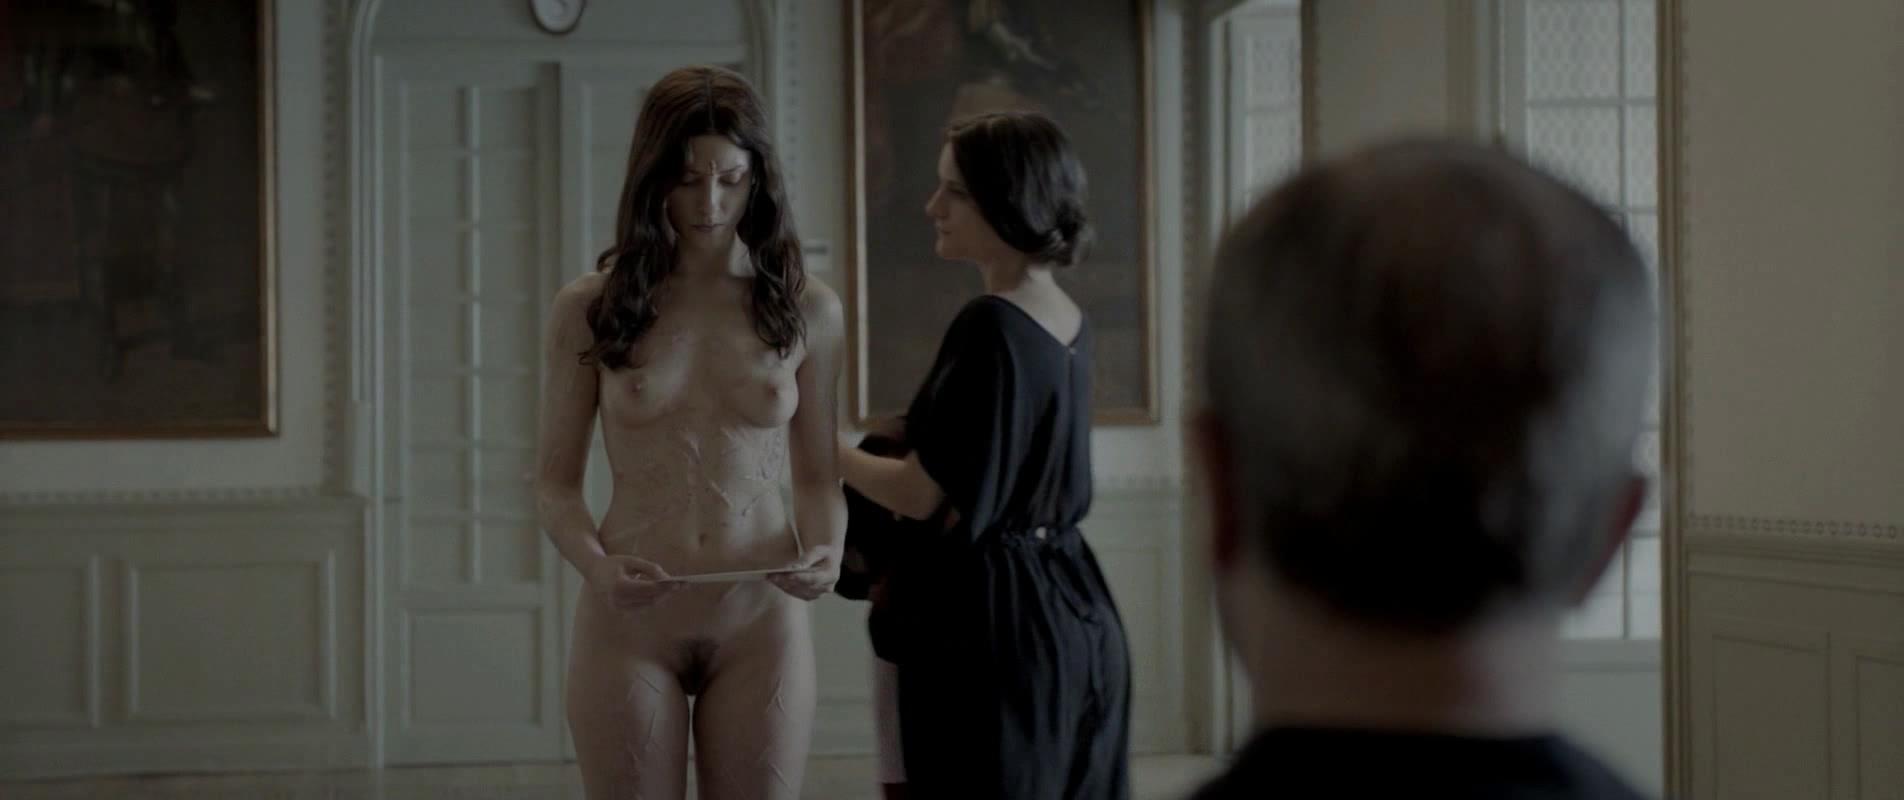 Barbara Lennie Nude Magical Girl 2014 Nude Celebs Tube